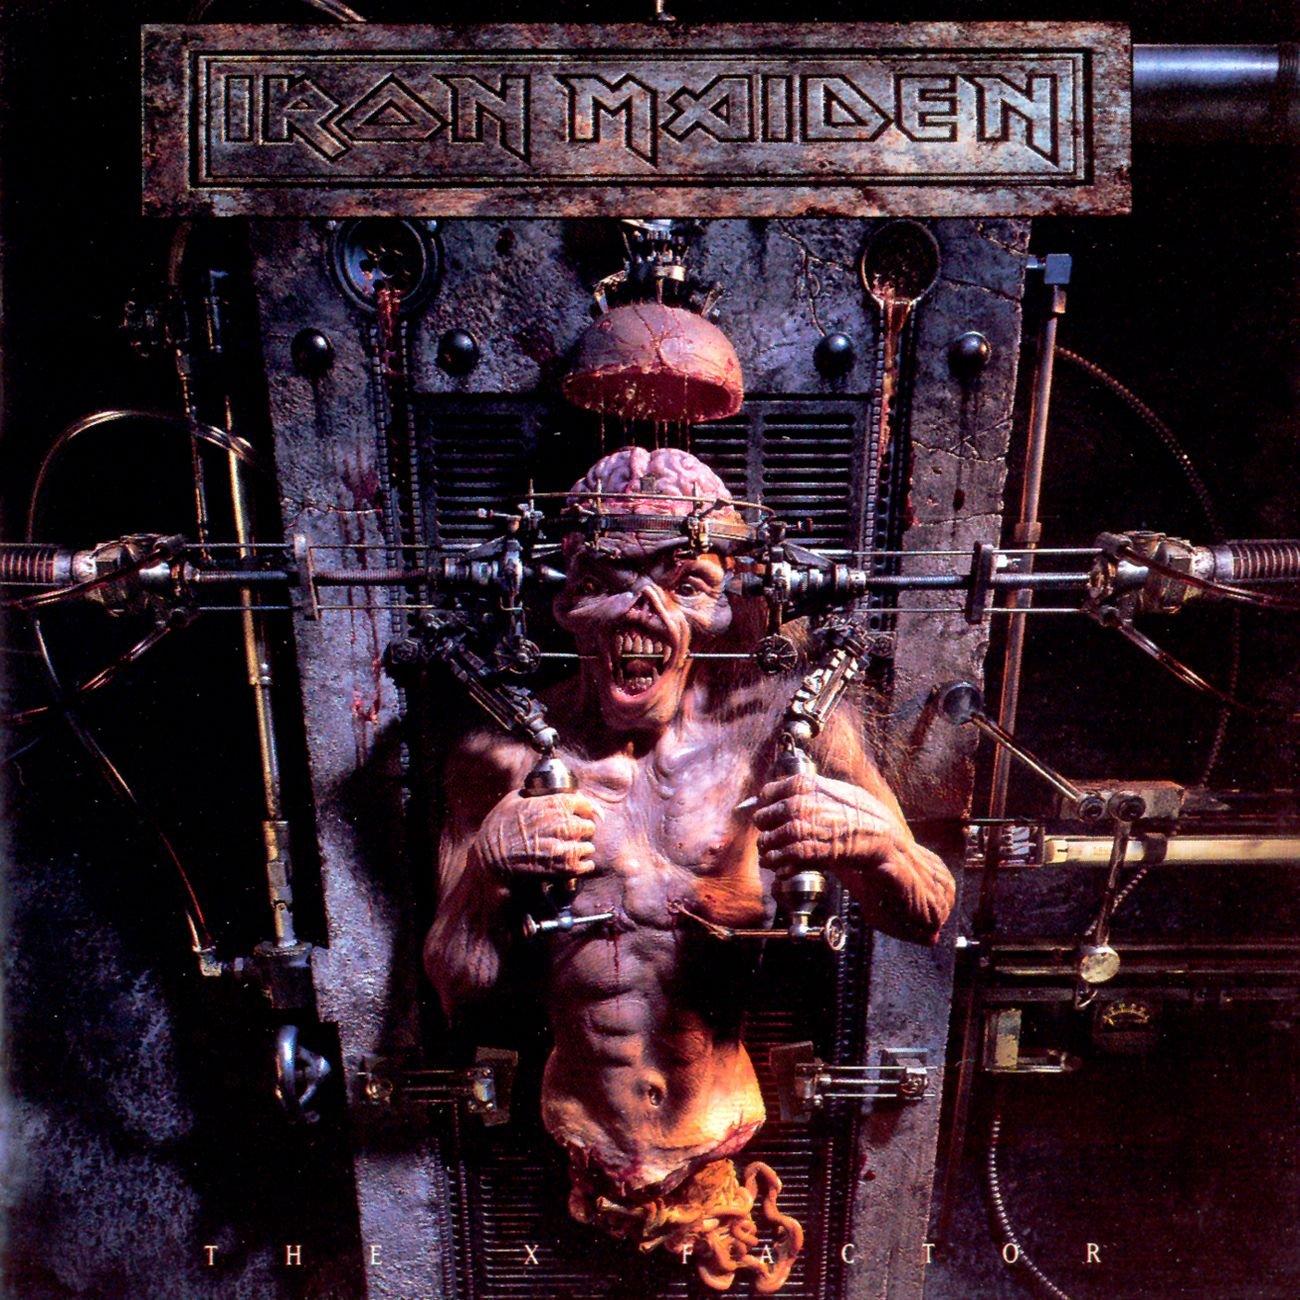 Pochette Iron Maiden 81iOv2uTITL._SL1300_